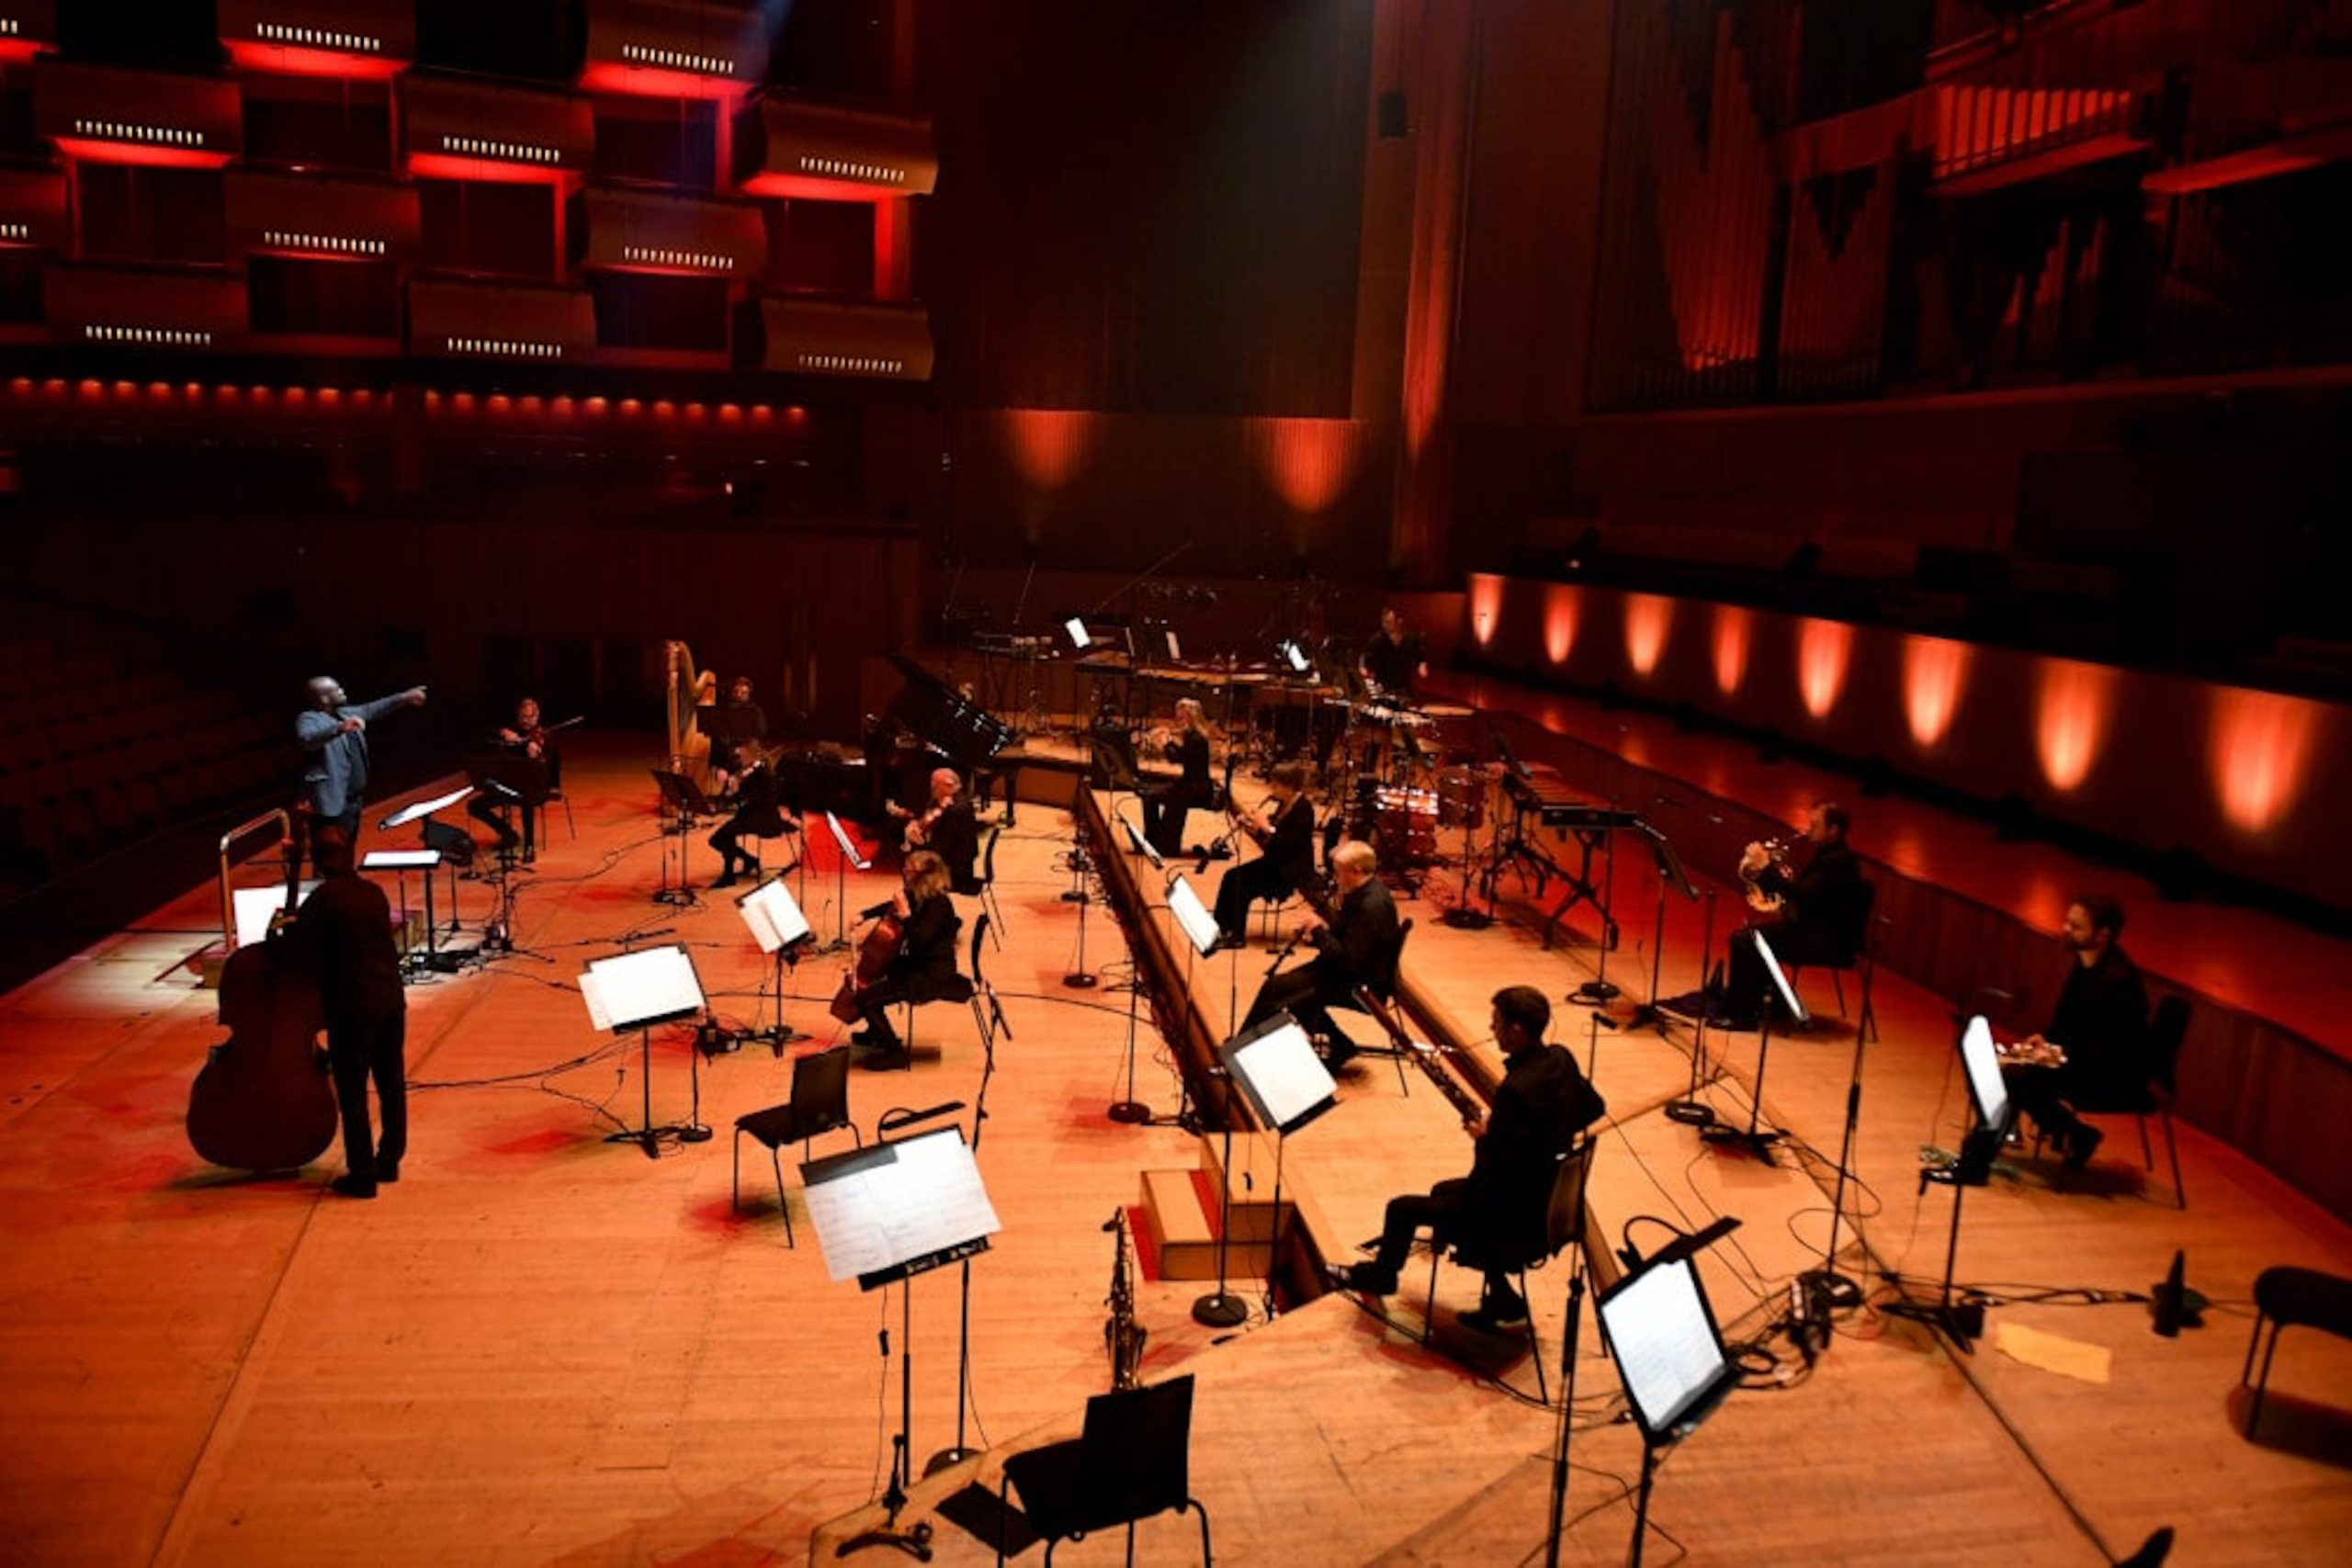 Vimbayi Kaziboni conducts a symphony in a concert hall